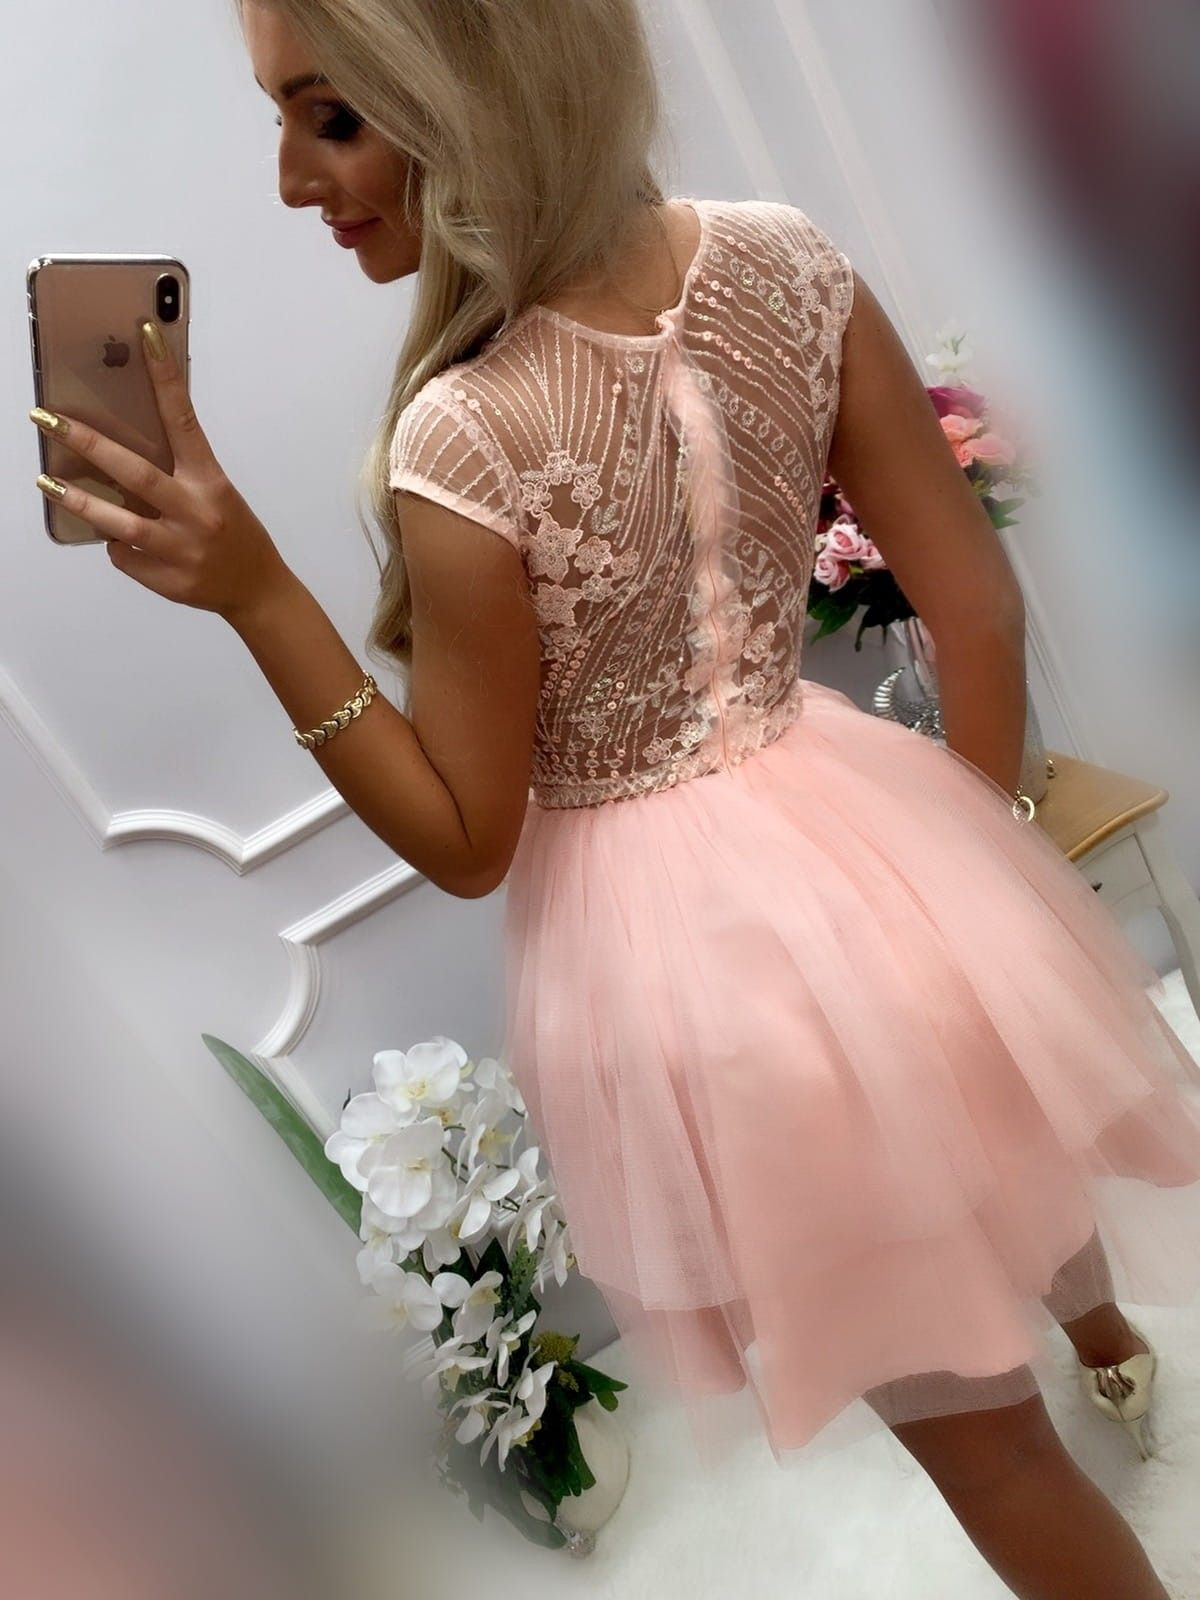 Sukienka Lososiowa Koronkowa Izaura Tiul Bombka Sukienki W Mohho Pl Dresses Flower Girl Dresses Tulle Skirt